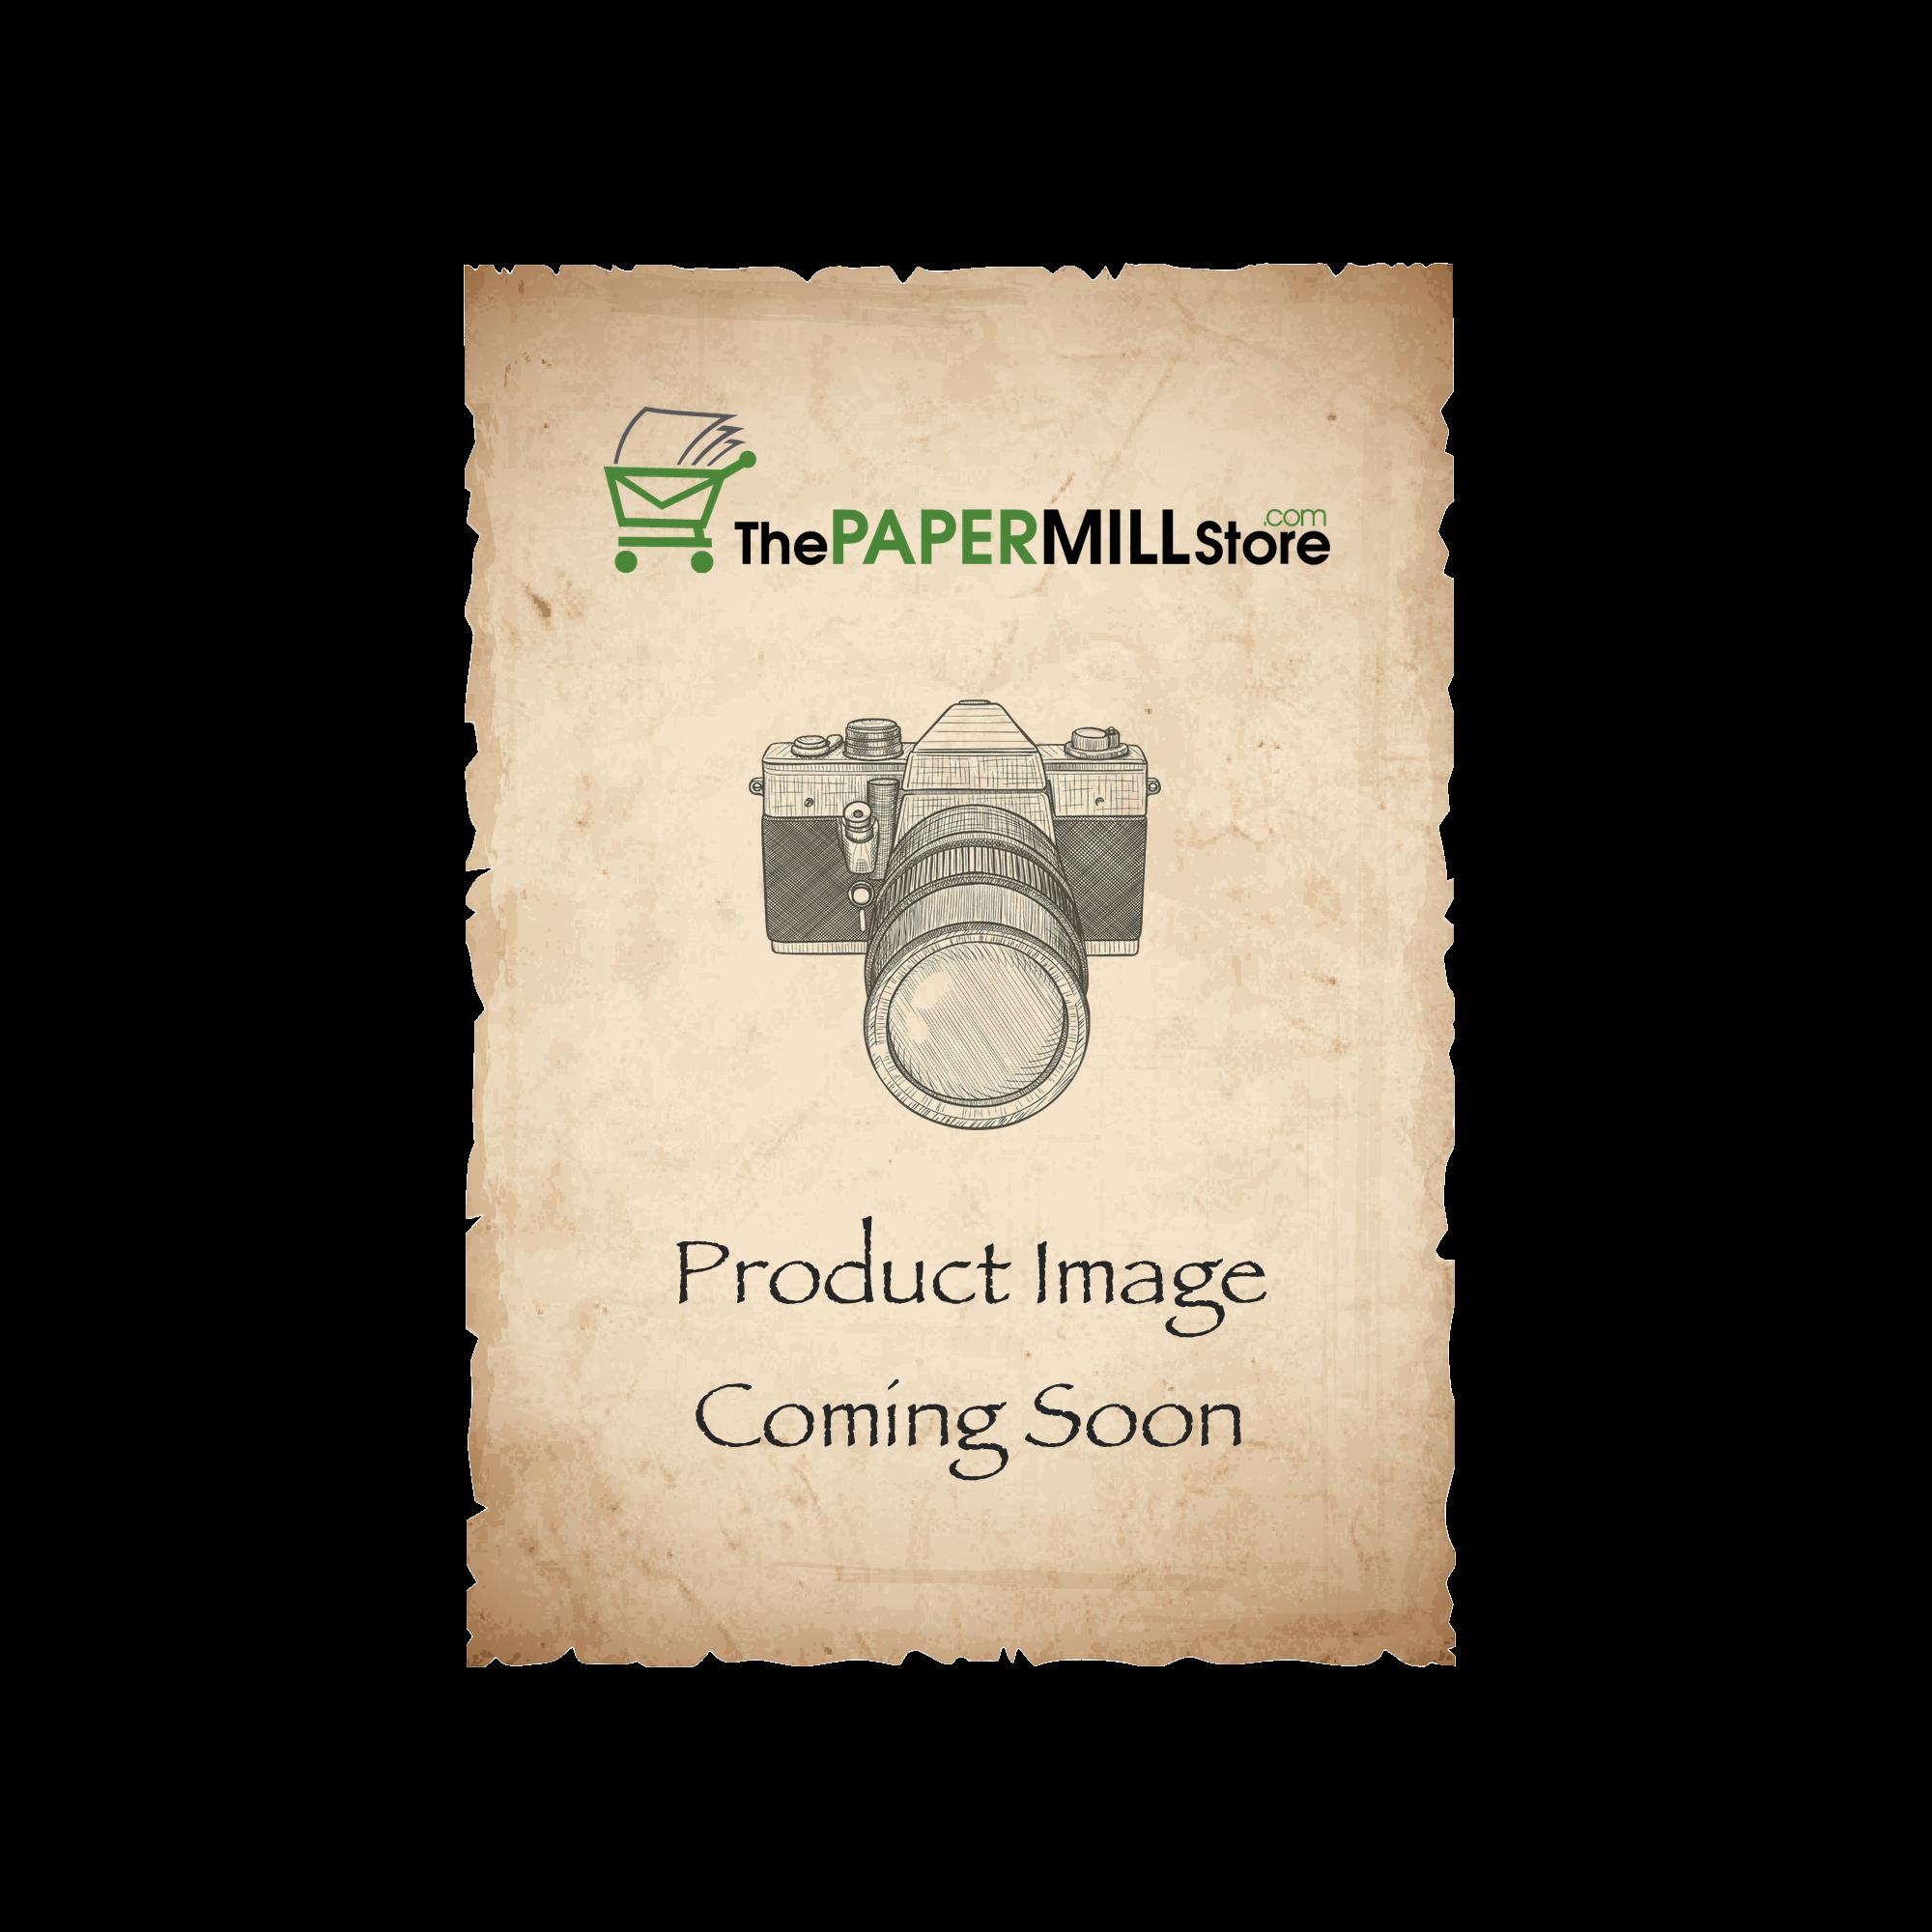 Ultrafelt Softwhite Paper - 23 x 35 in 80 lb Text Premium Felt  30% Recycled 1000 per Carton